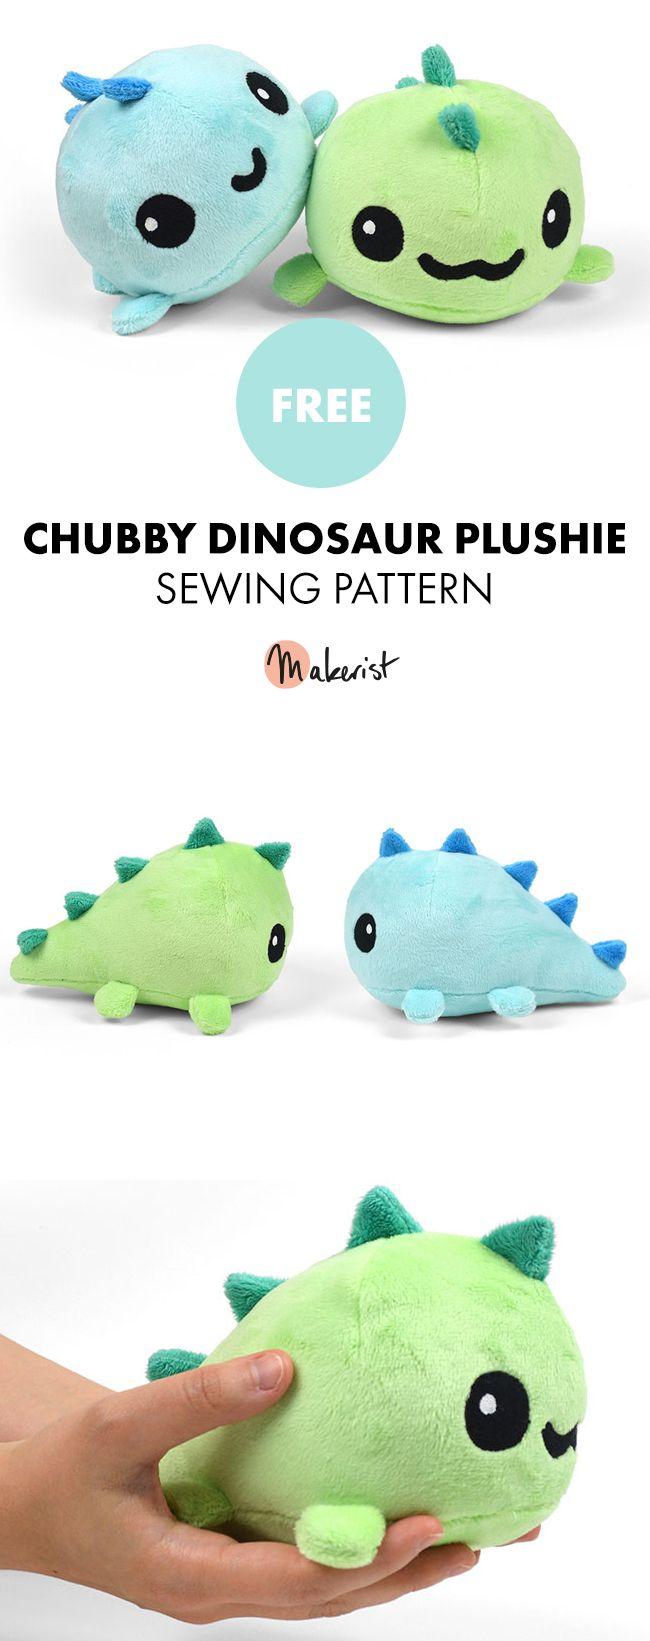 Tiny Chubby Dinosaur Plush Toy - Free Sewing Patterns via Makerist.com